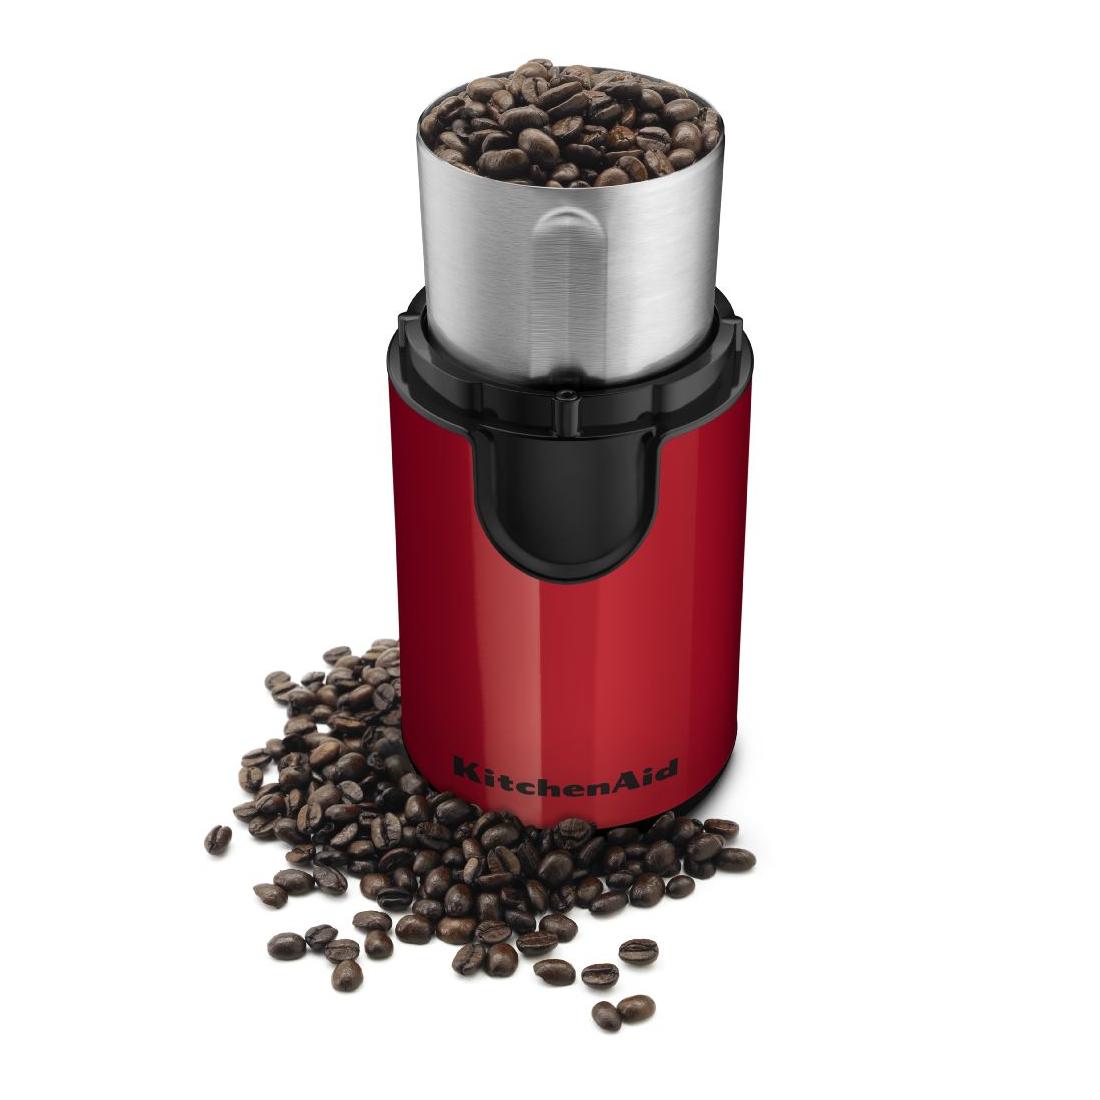 KitchenAid Stainless Steel Blade Empire Red Coffee Grinder